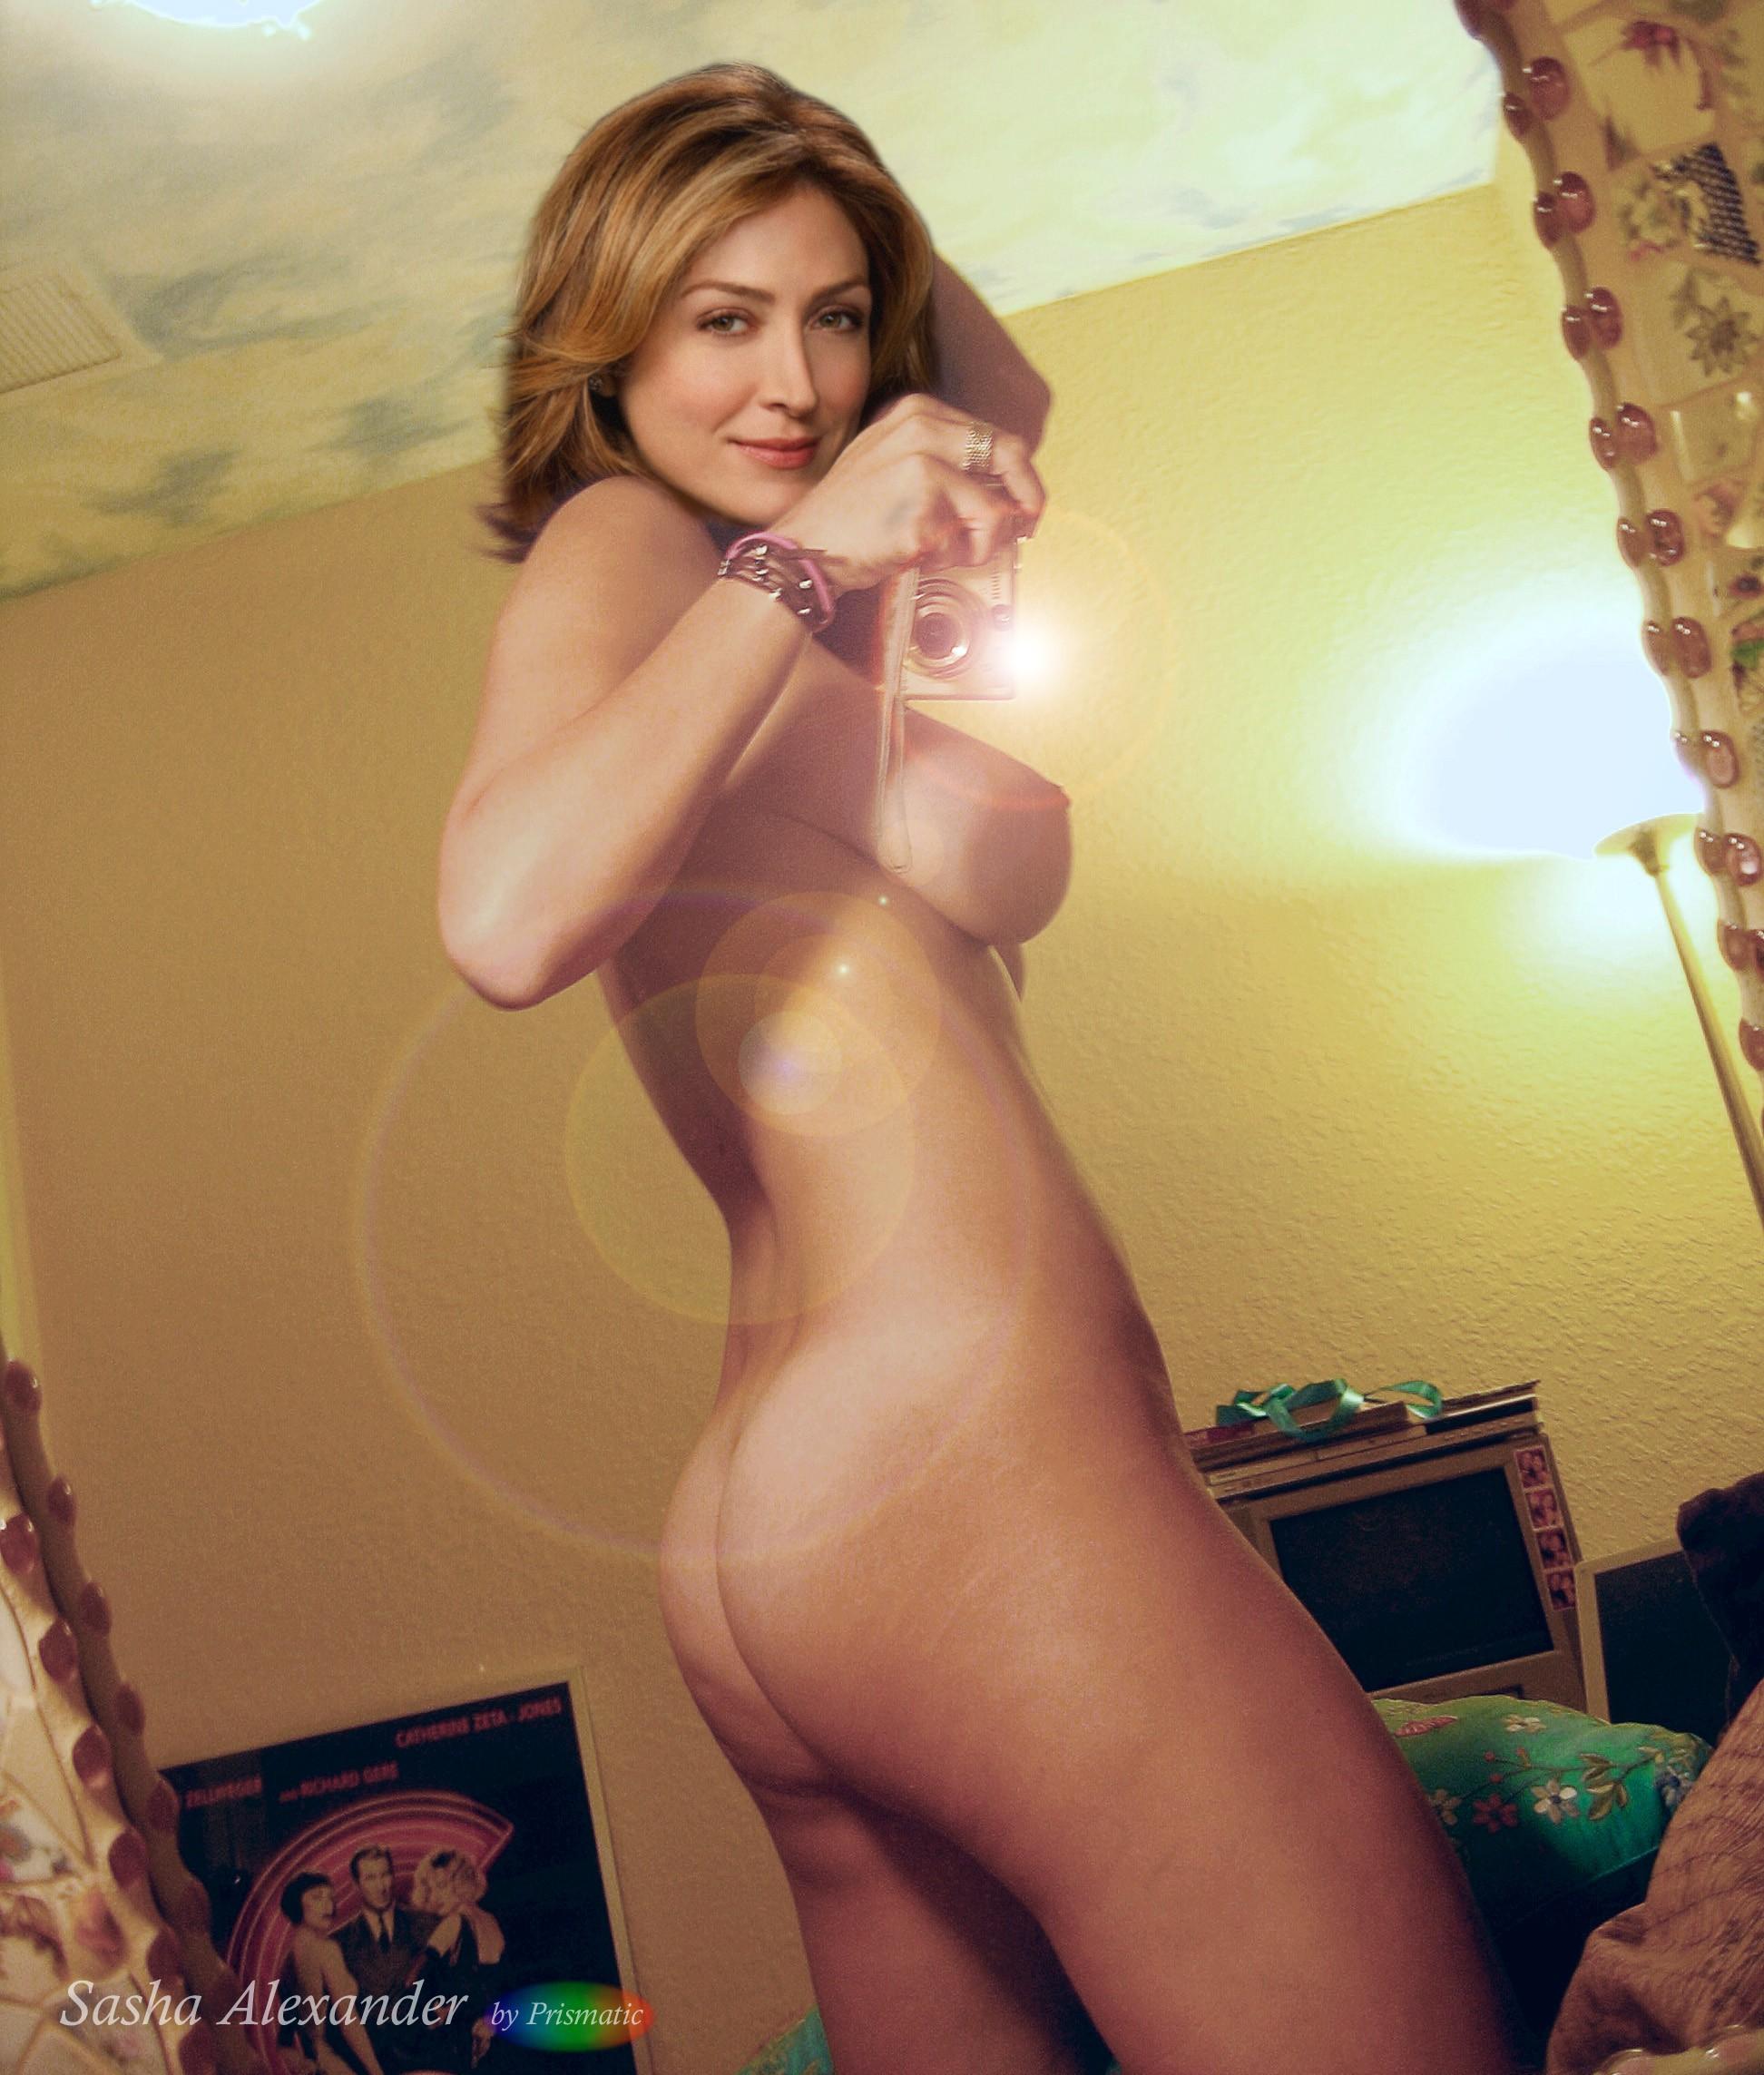 Sasha alexander nue photo — photo 2